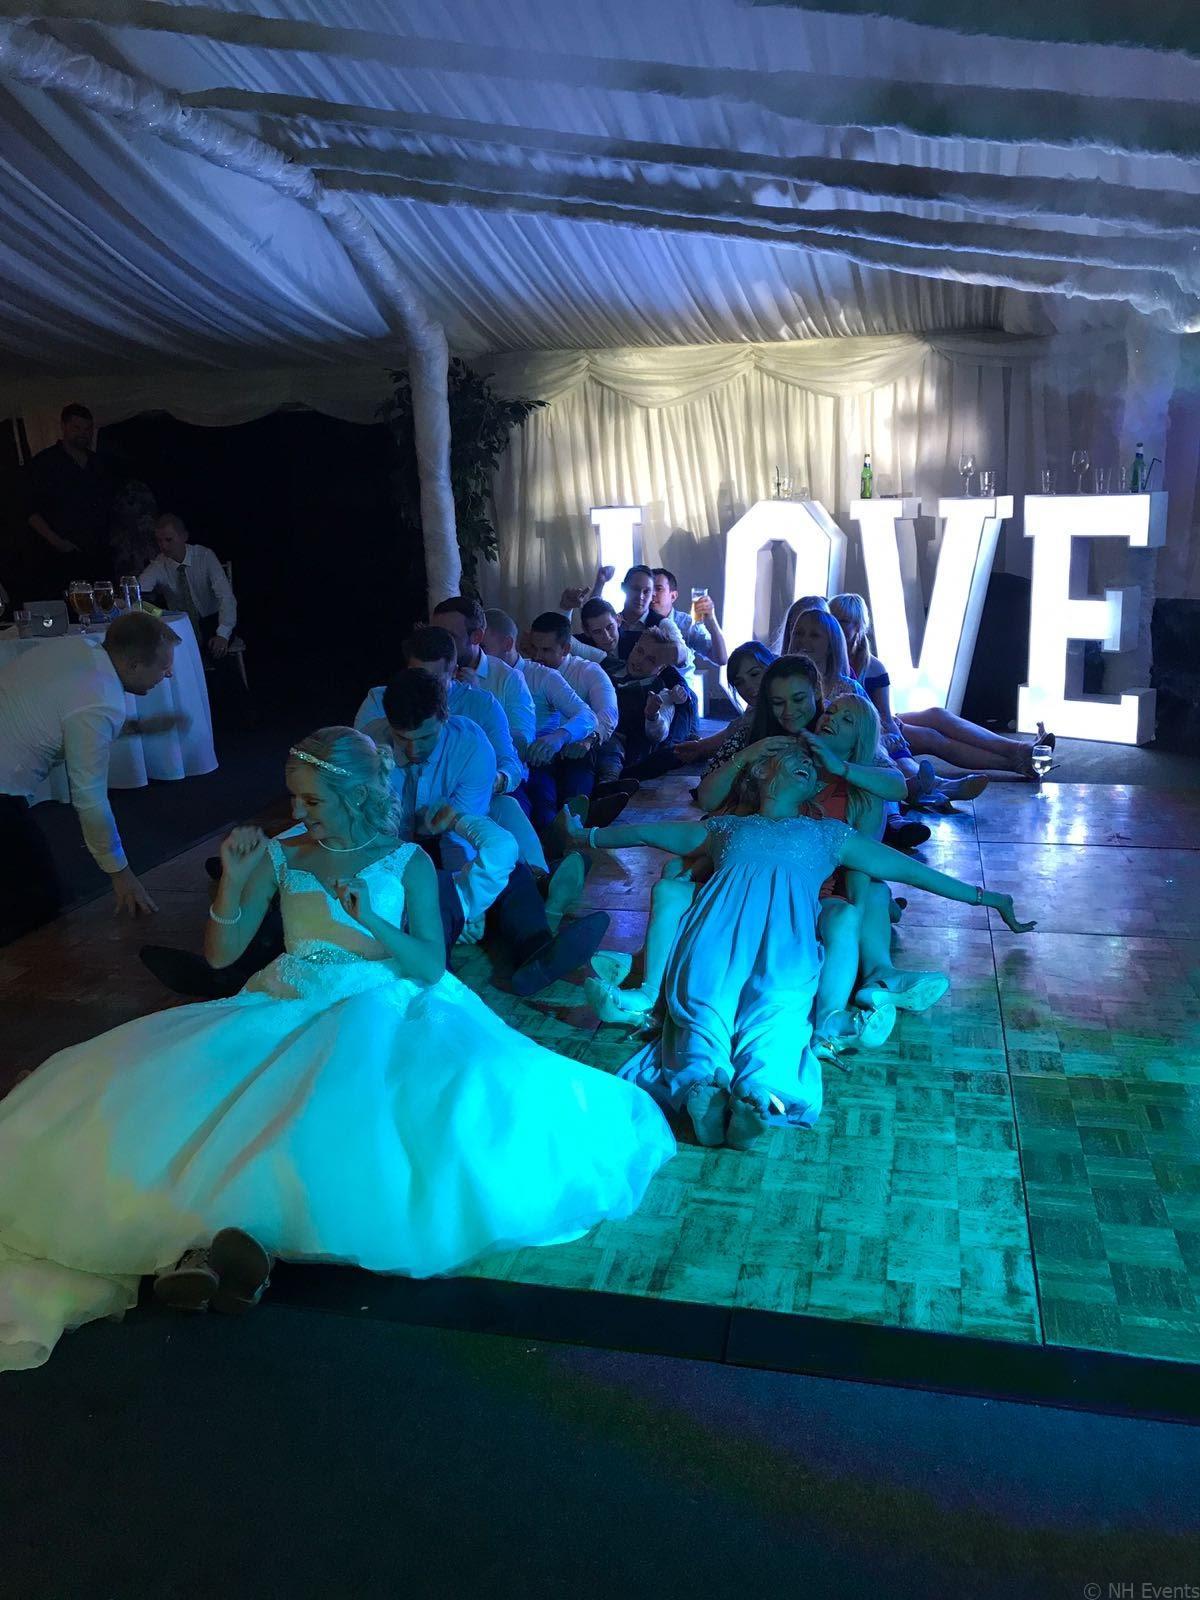 Luke and Beth's Wedding 29.7.17 at Lenwade House Hotel, Norfolk - Norfolk Wedding DJ